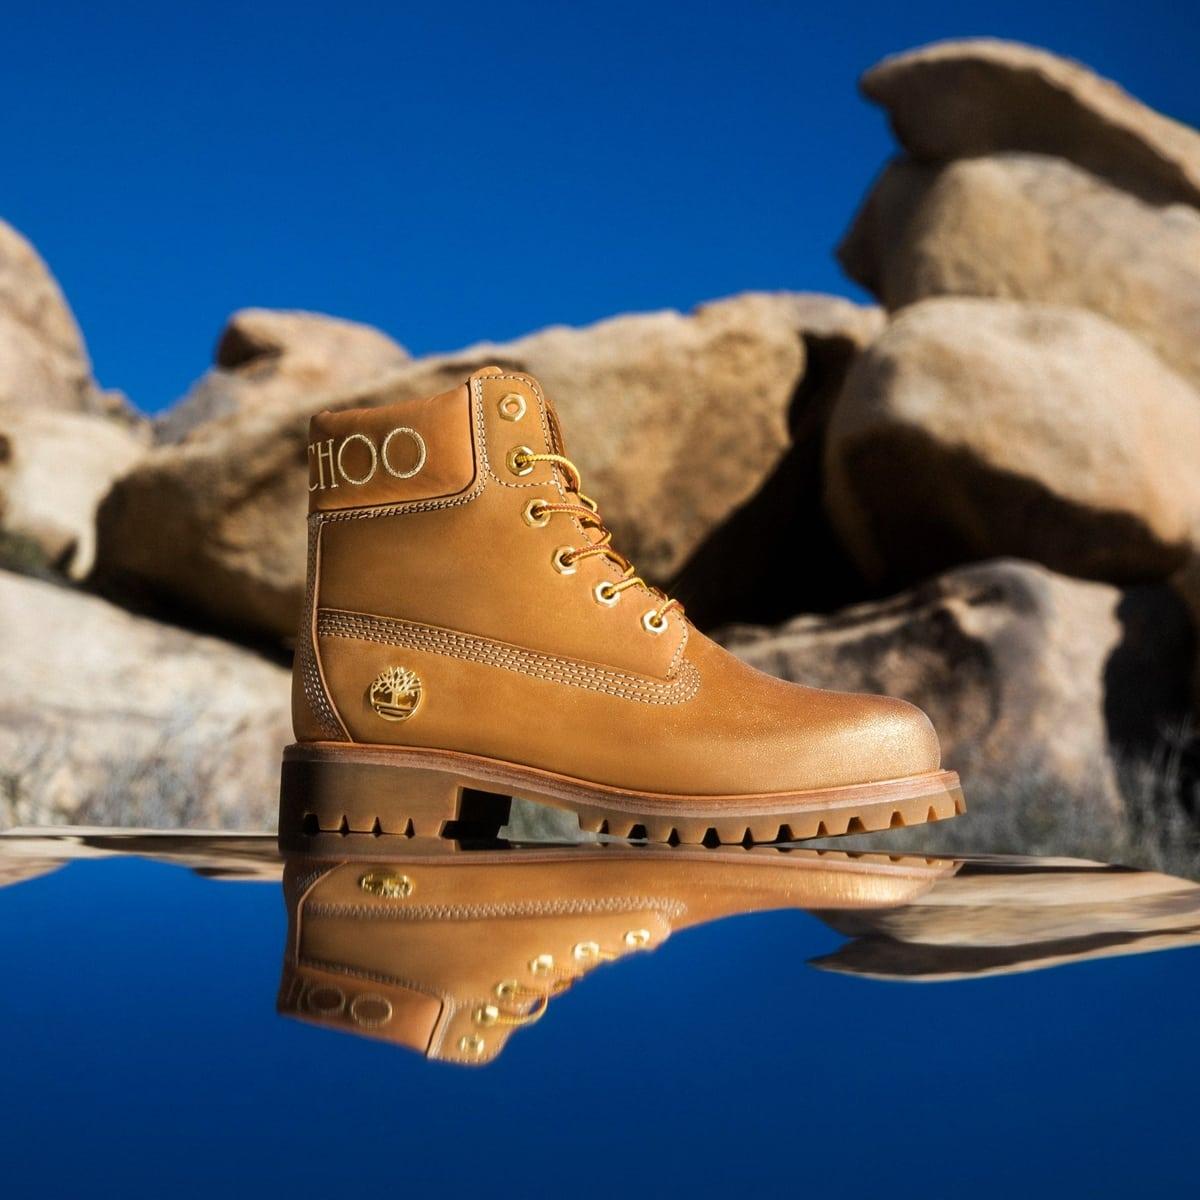 Jimmy Choo x Timberland wheat nubuck leather boots with gold glitter